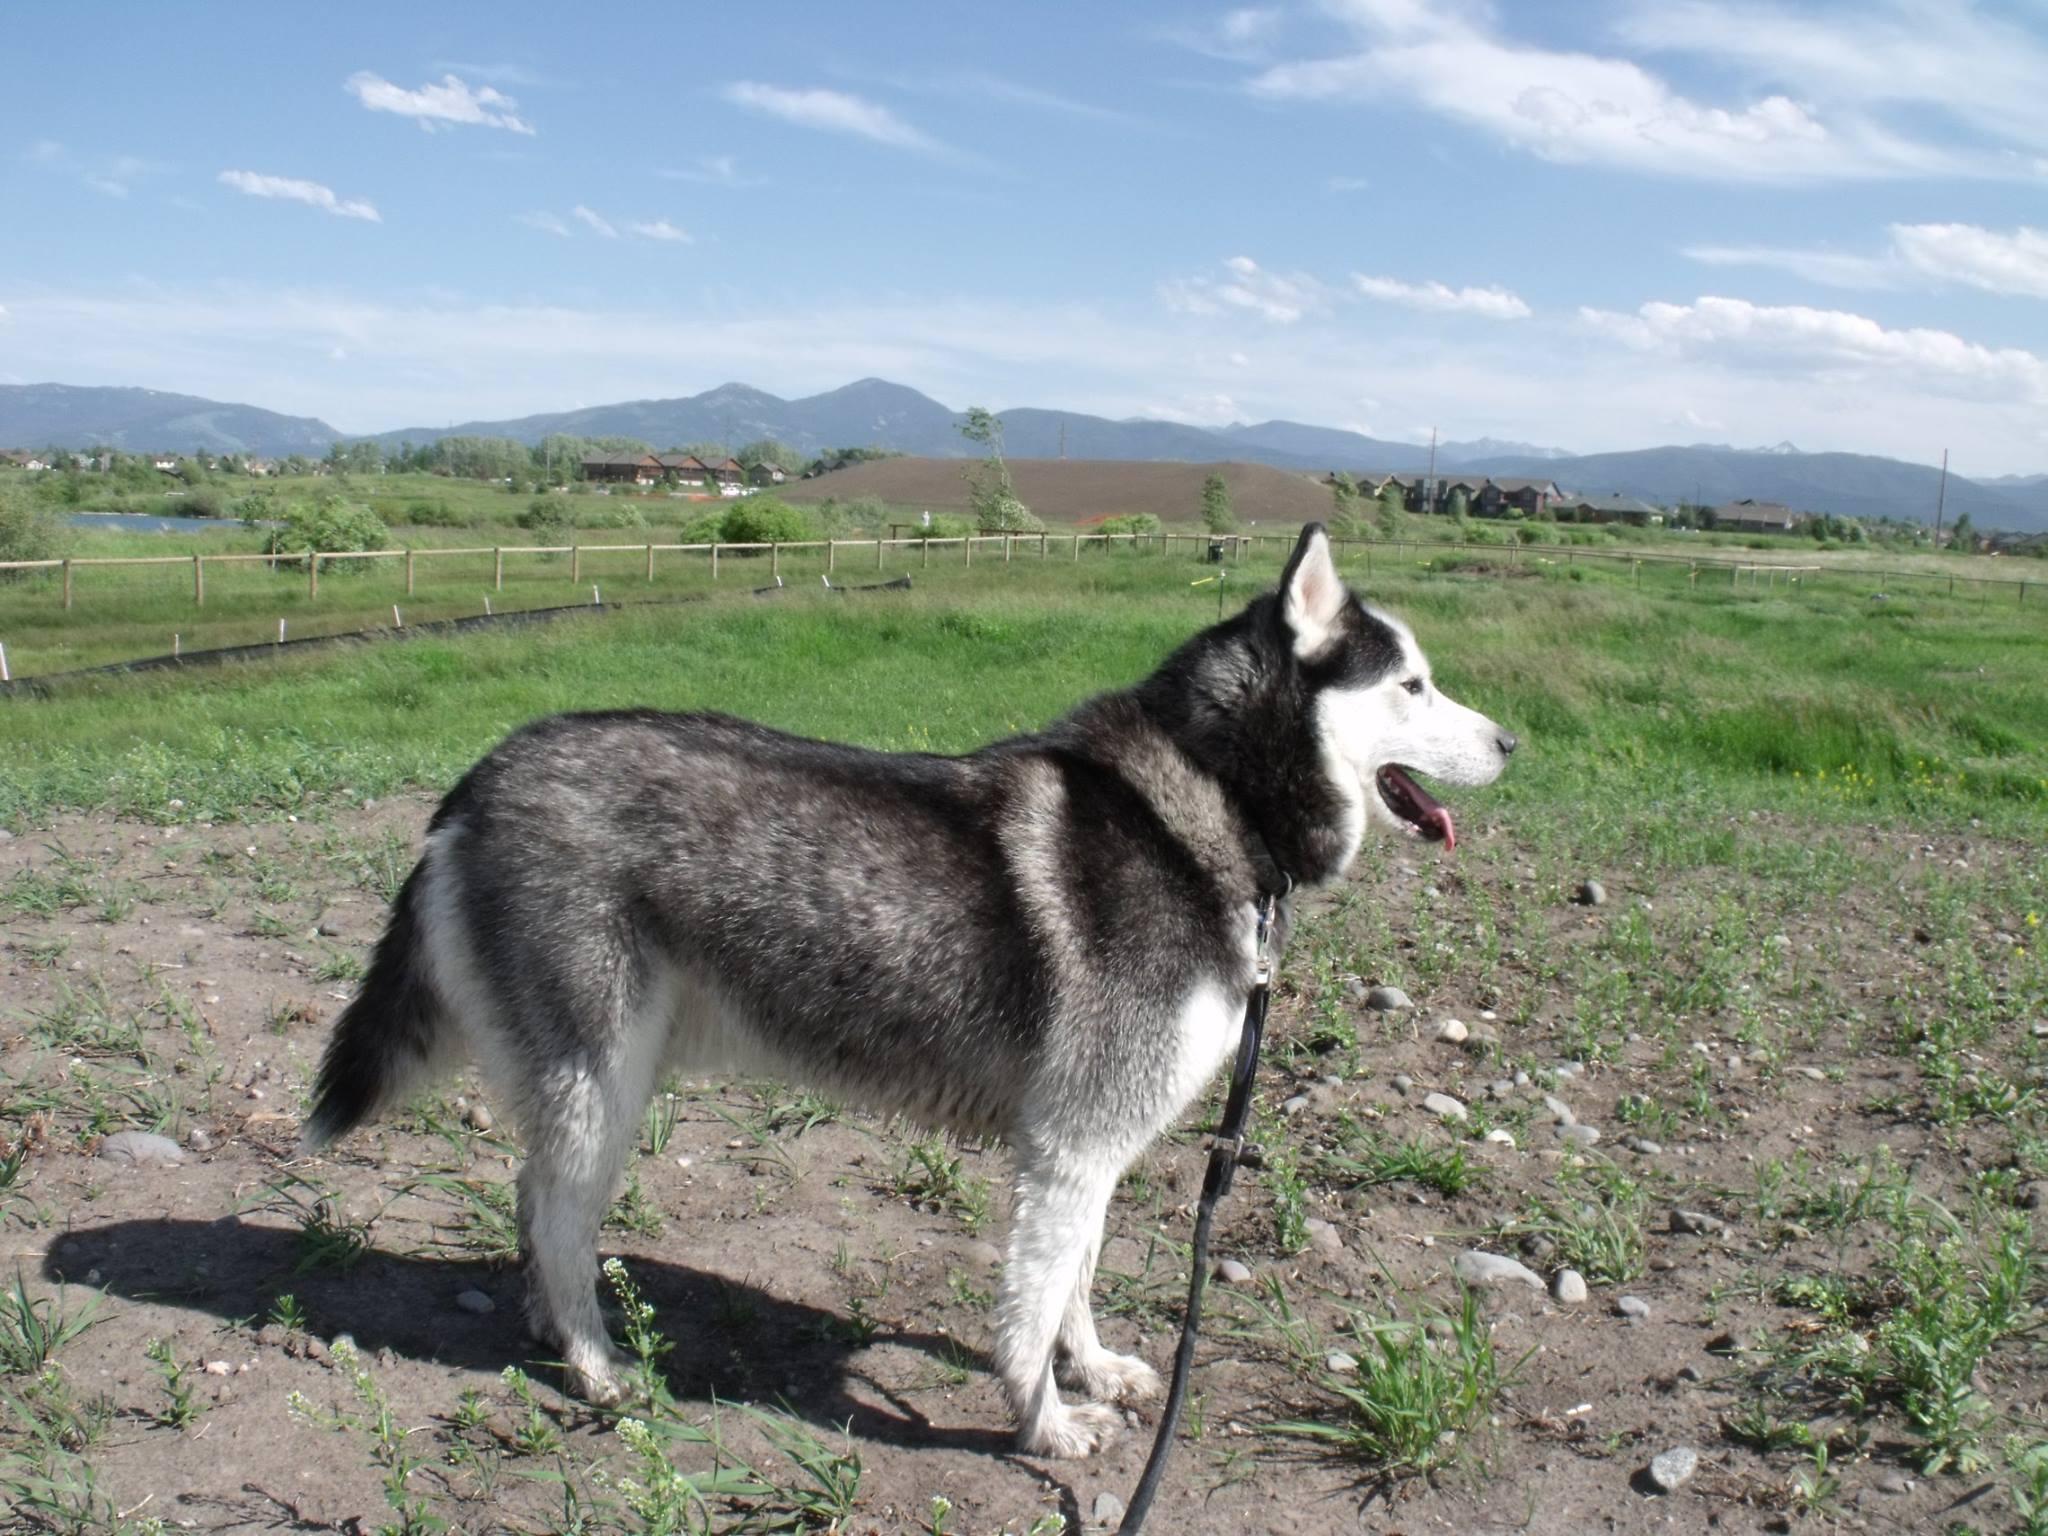 Gallifrey surveying the dog park in Bozeman, MT.